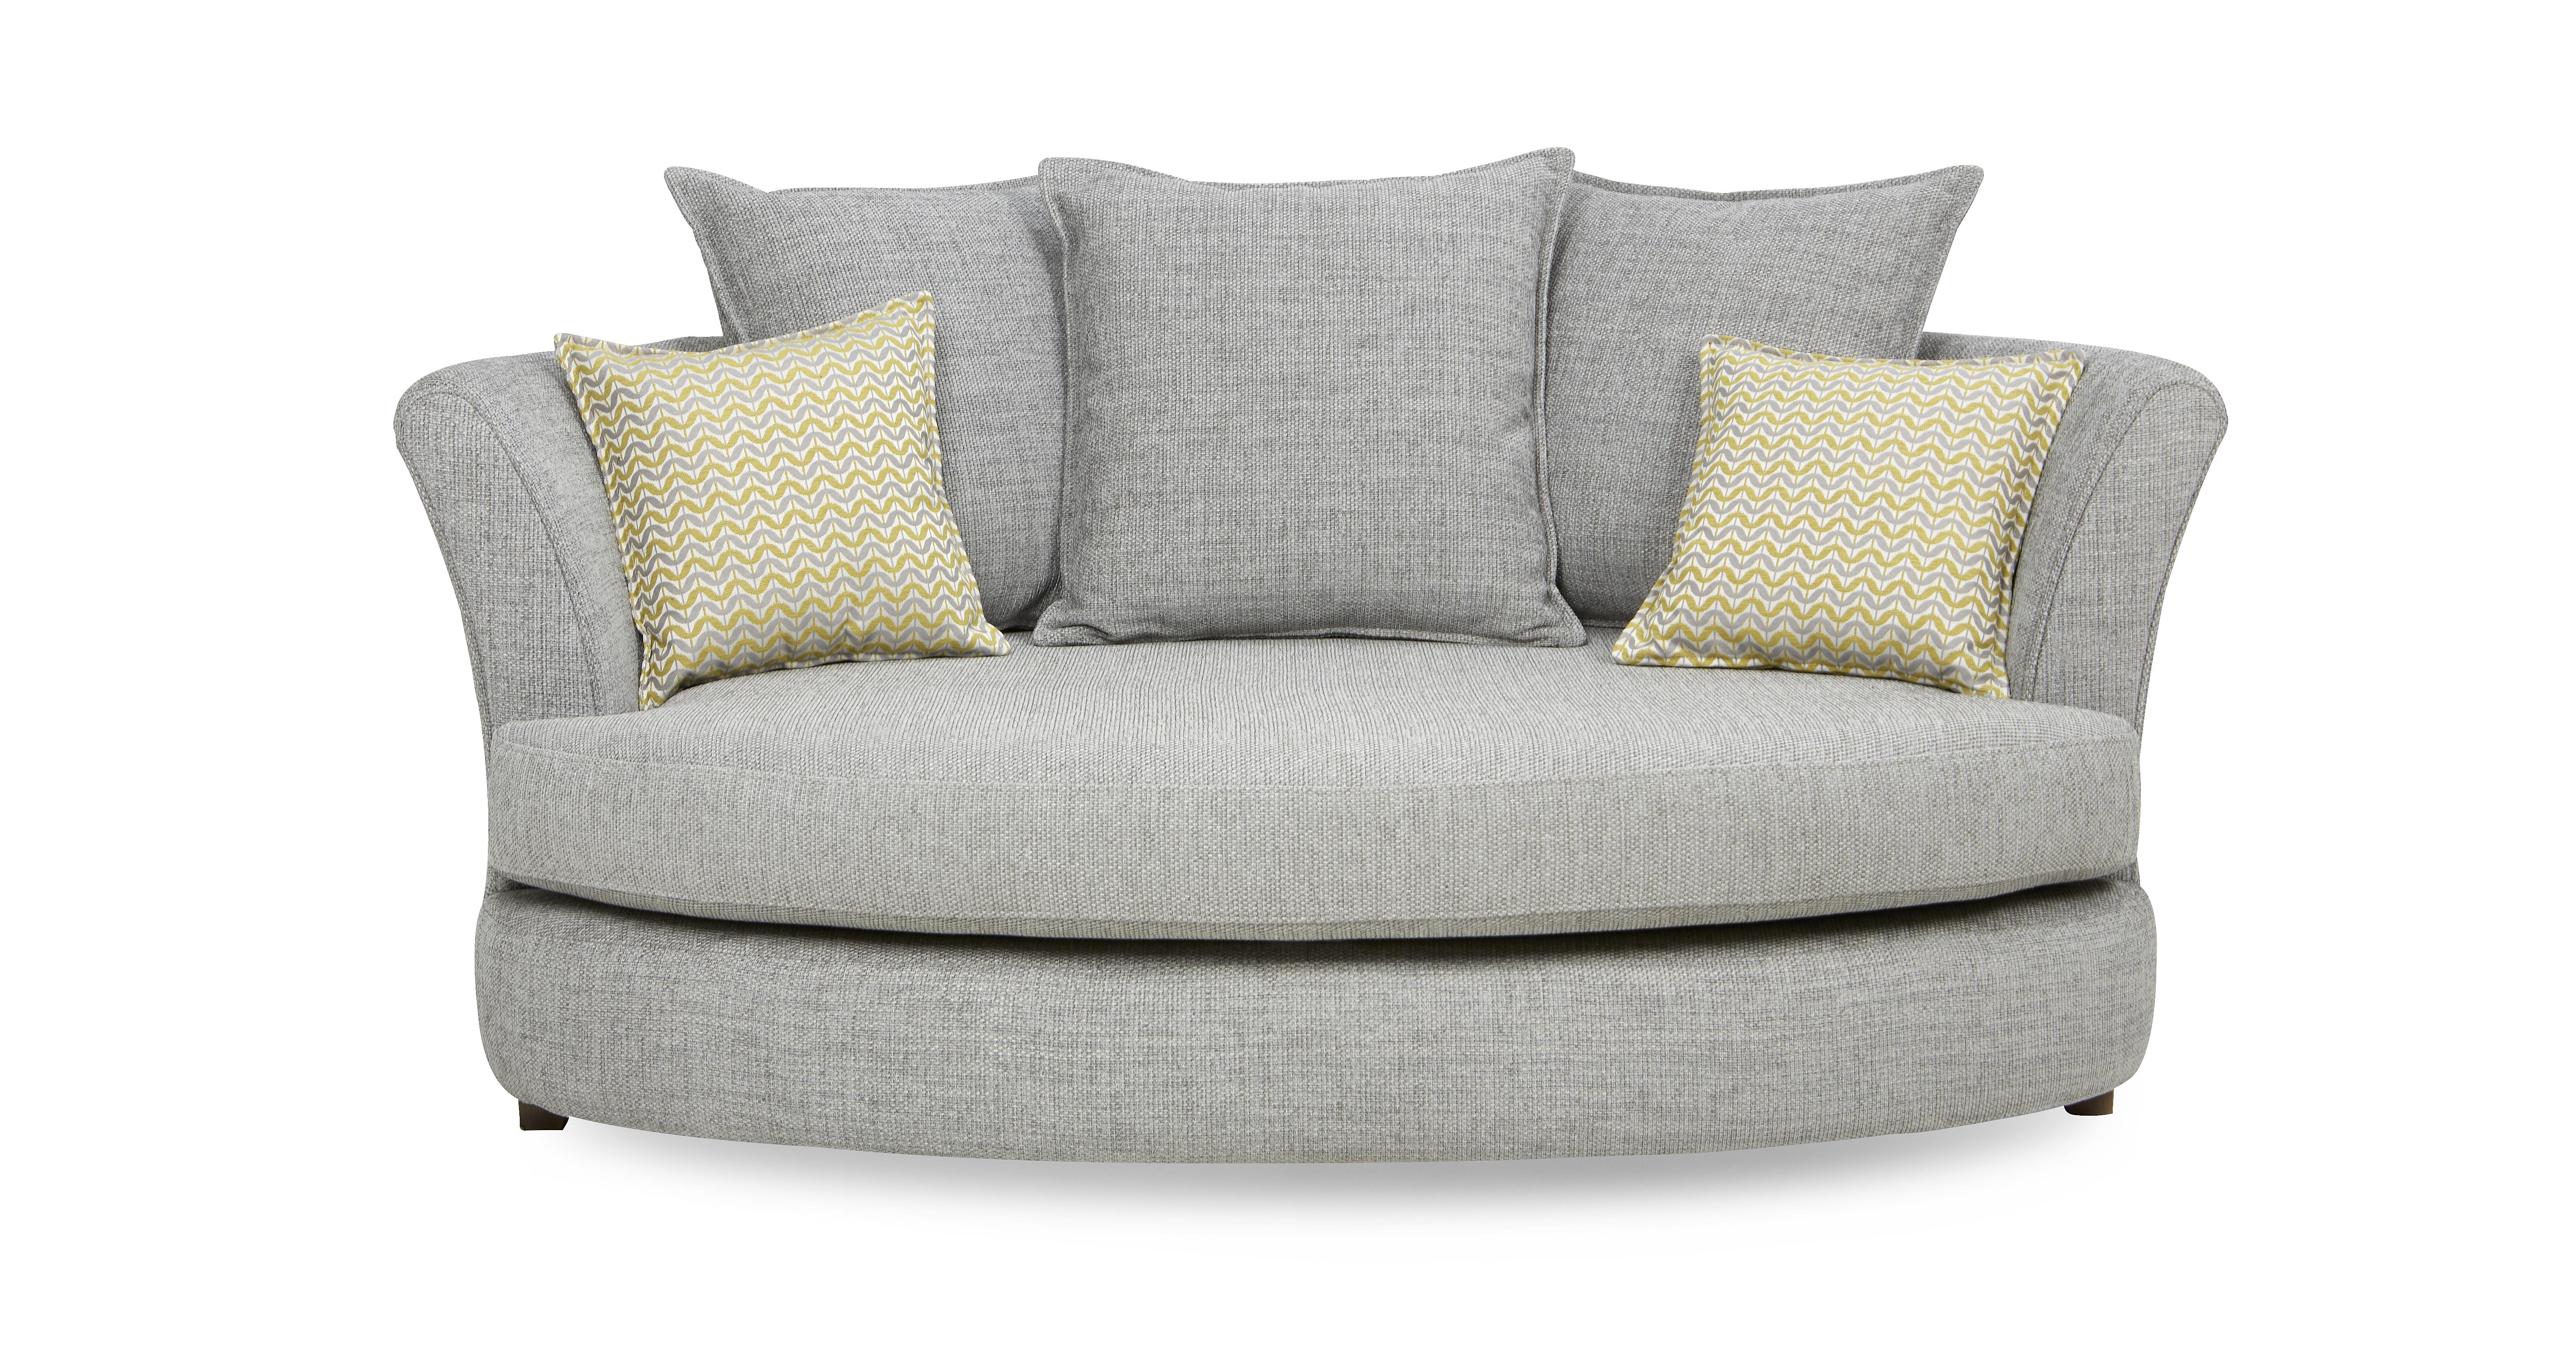 dfs french connection quartz sofa review lack table white cuddler brokeasshome